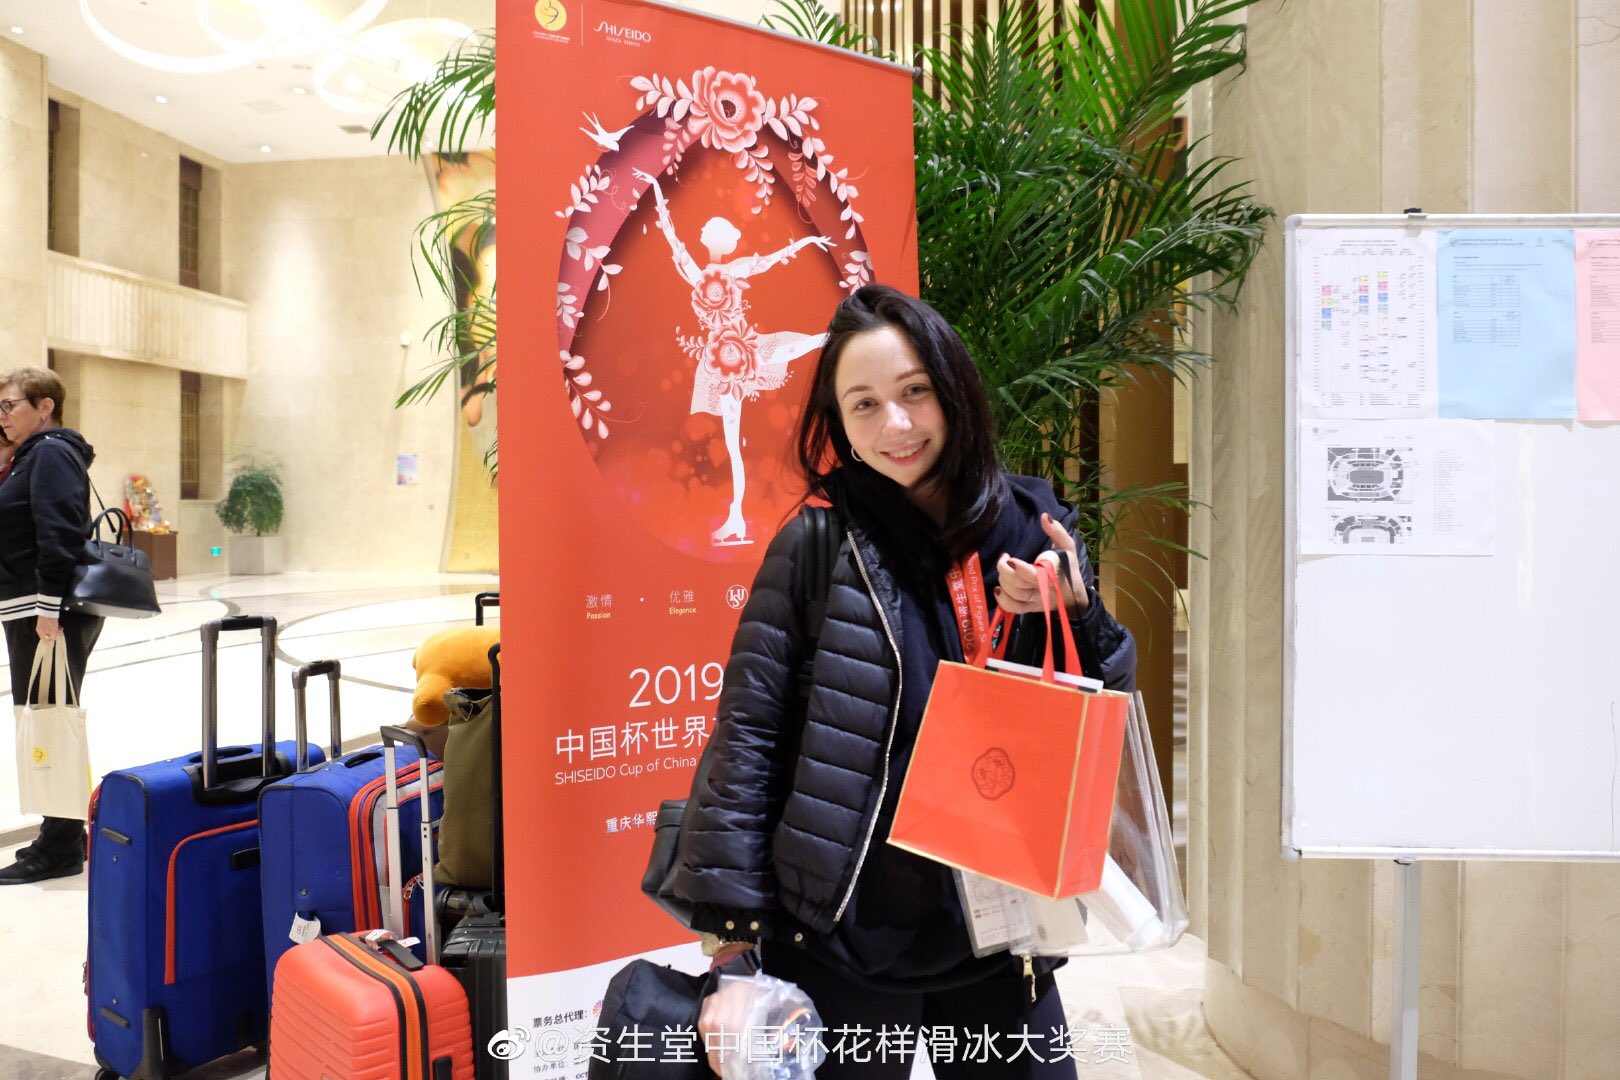 GP - 4 этап. Cup of China Chongqing / CHN November 8-10, 2019 - Страница 2 EIsyf-3UcAAIv5L?format=jpg&name=large